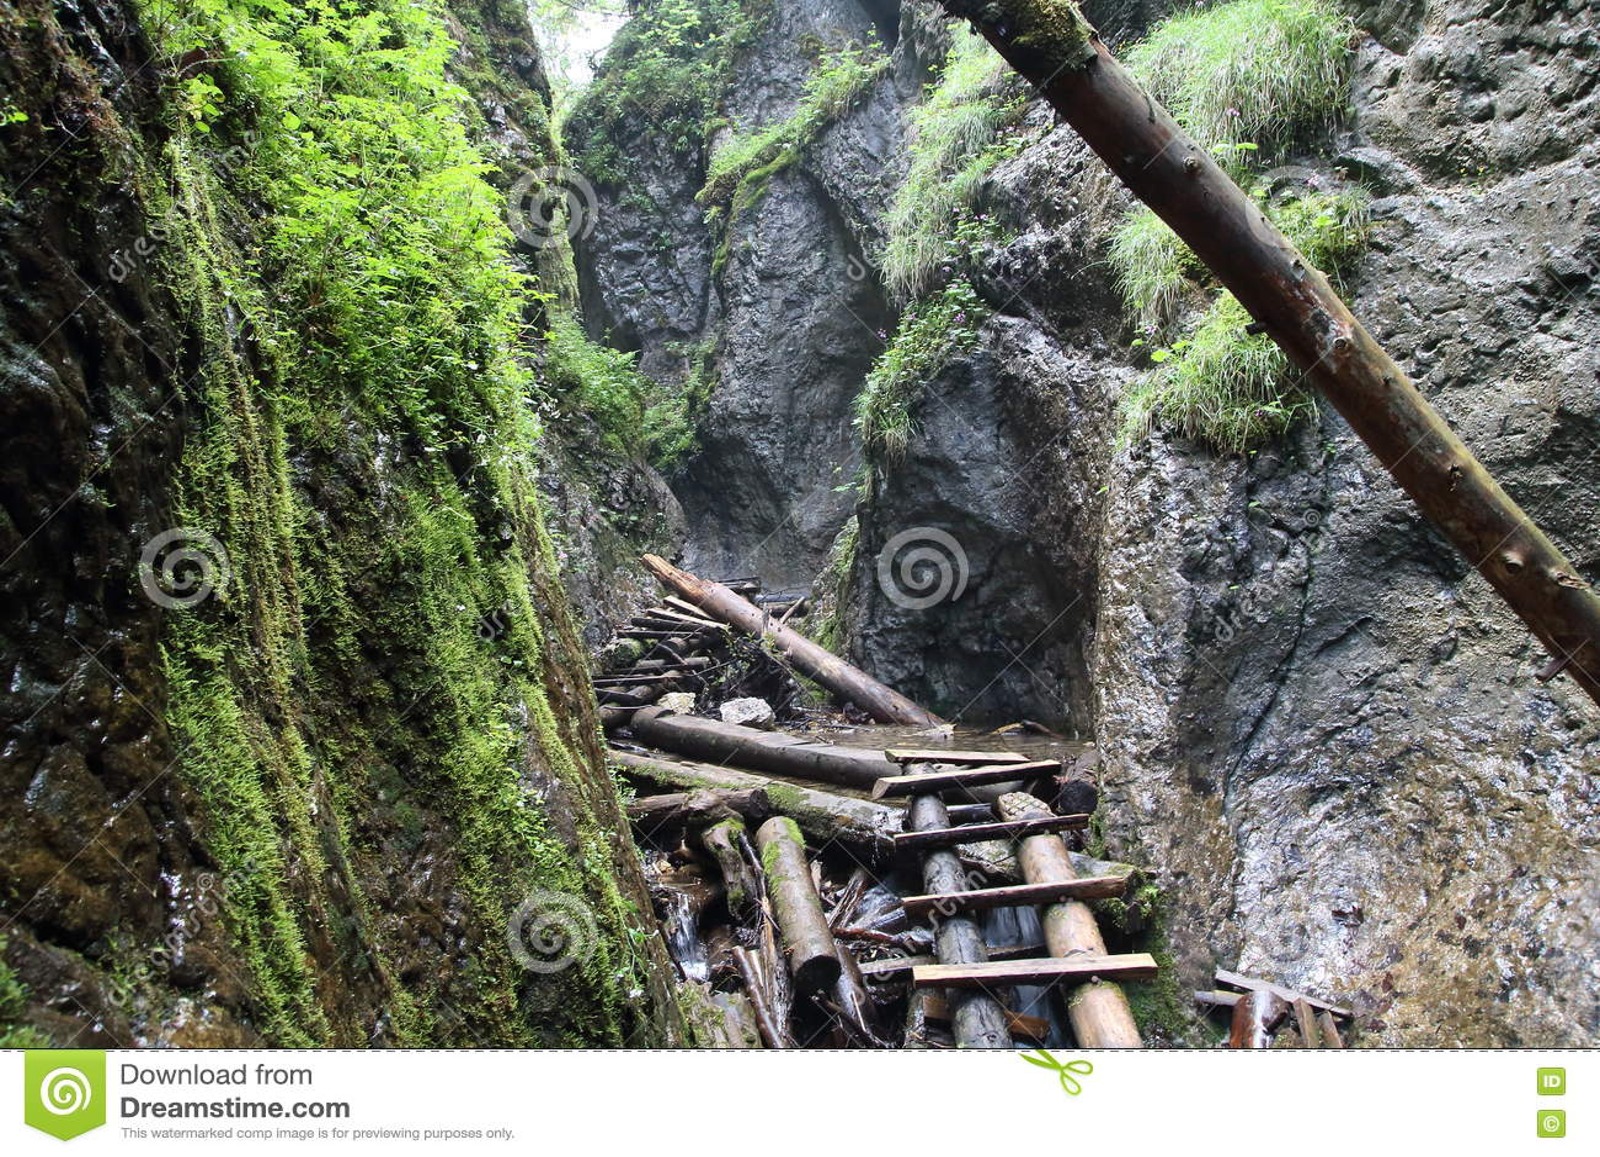 Big Falcon ravine, Slovak Paradise, Slovakia